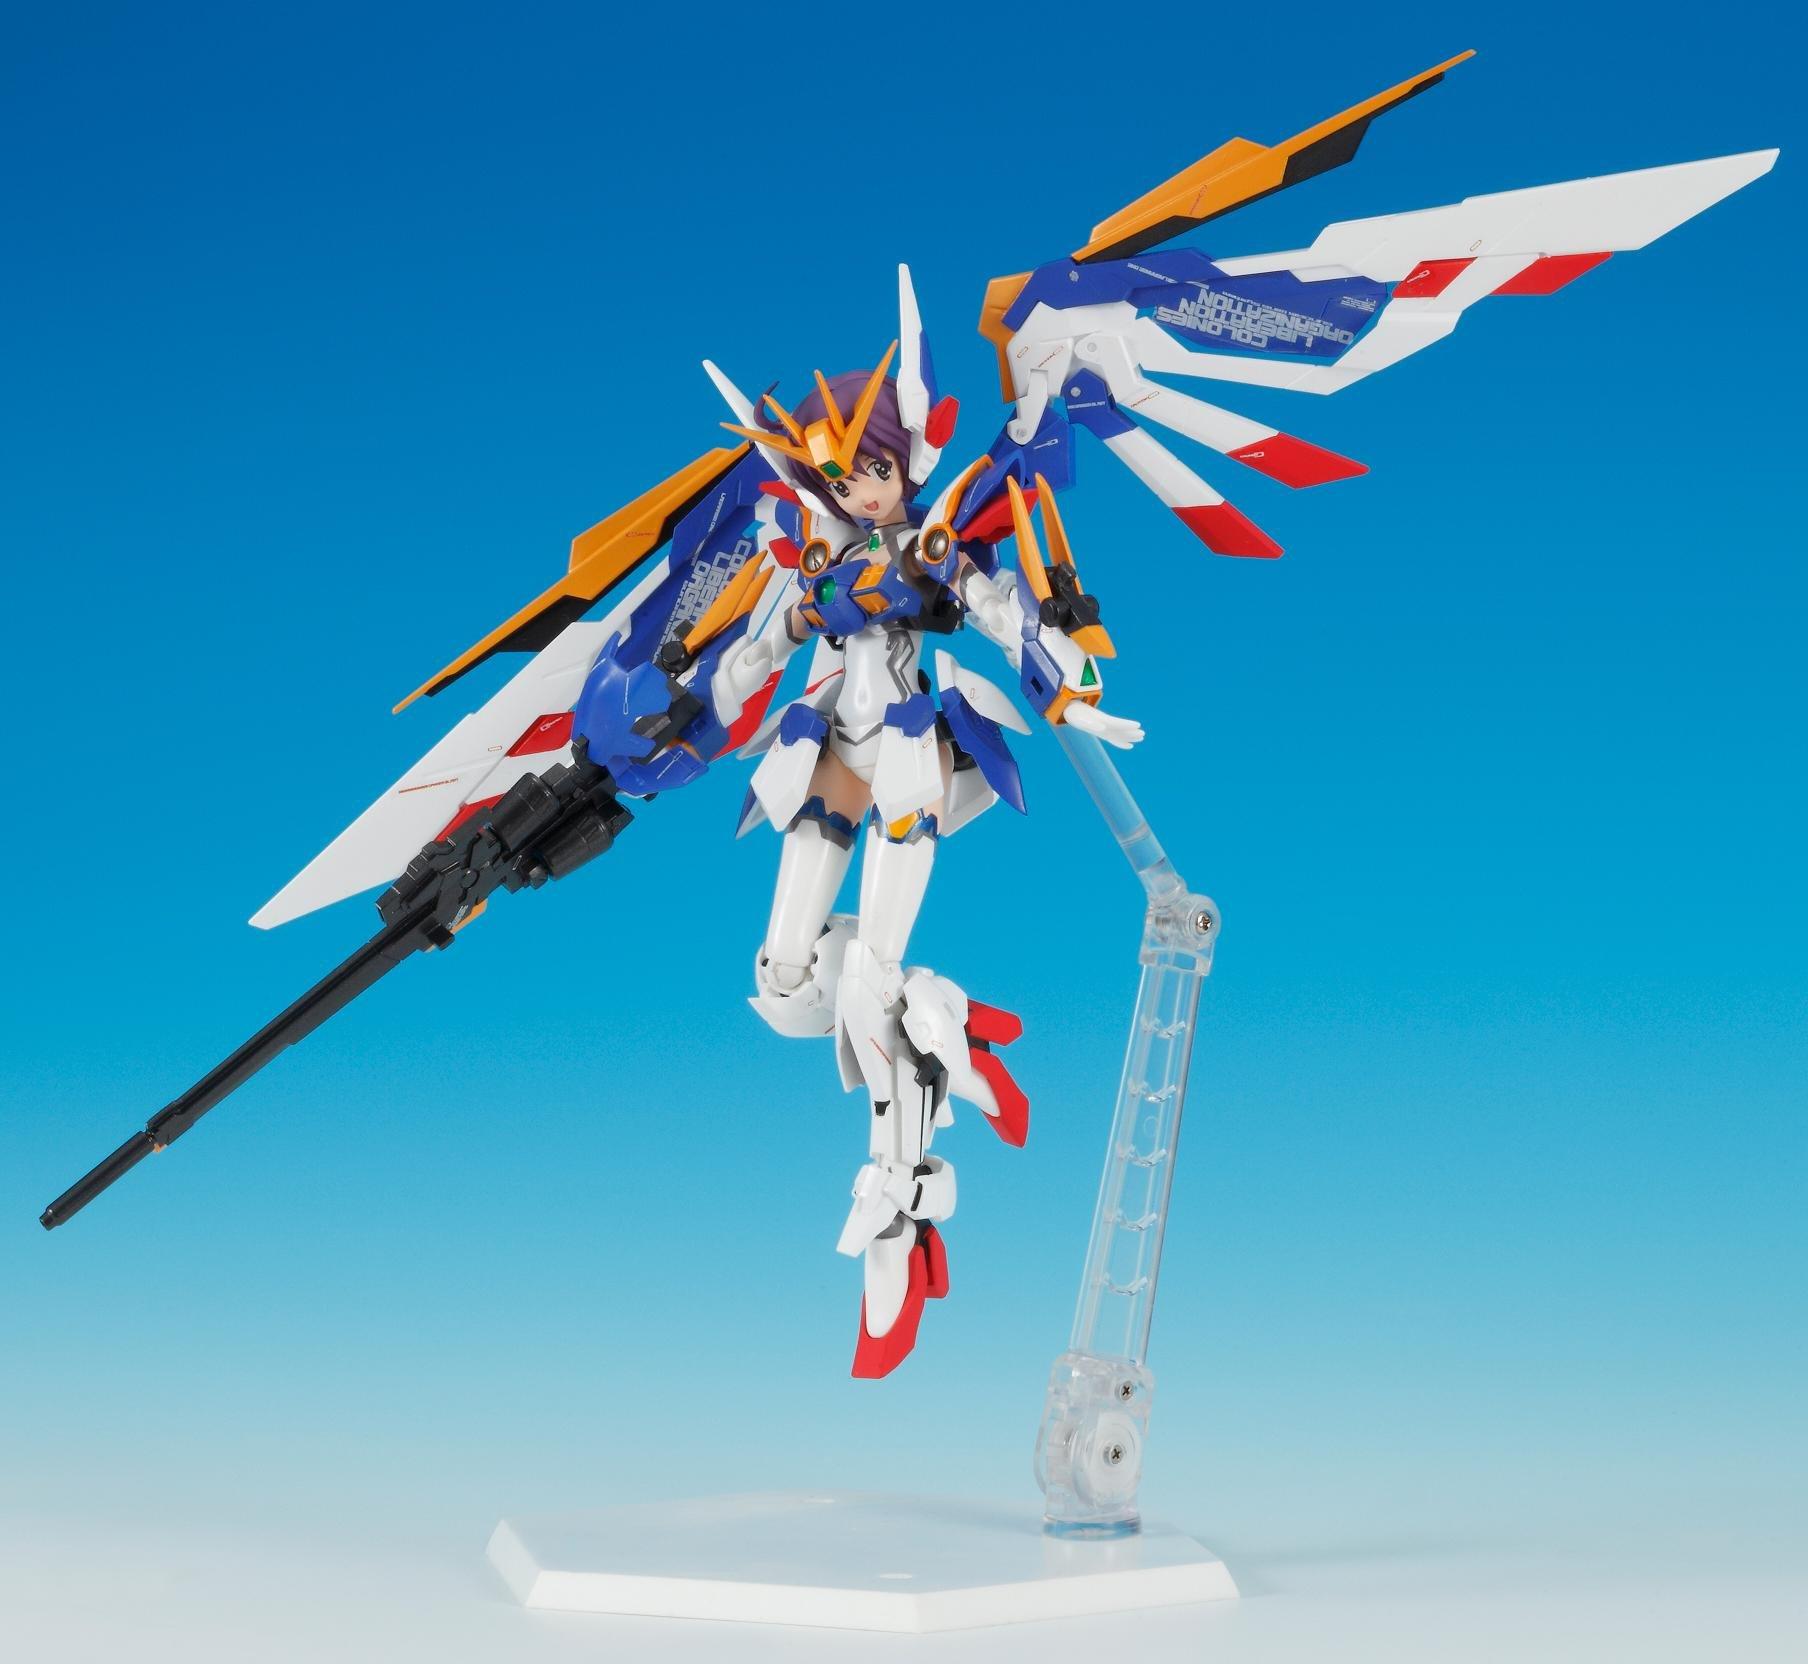 Armor Girls Project MS Shojo Wing Gundam EW Ver. New Large